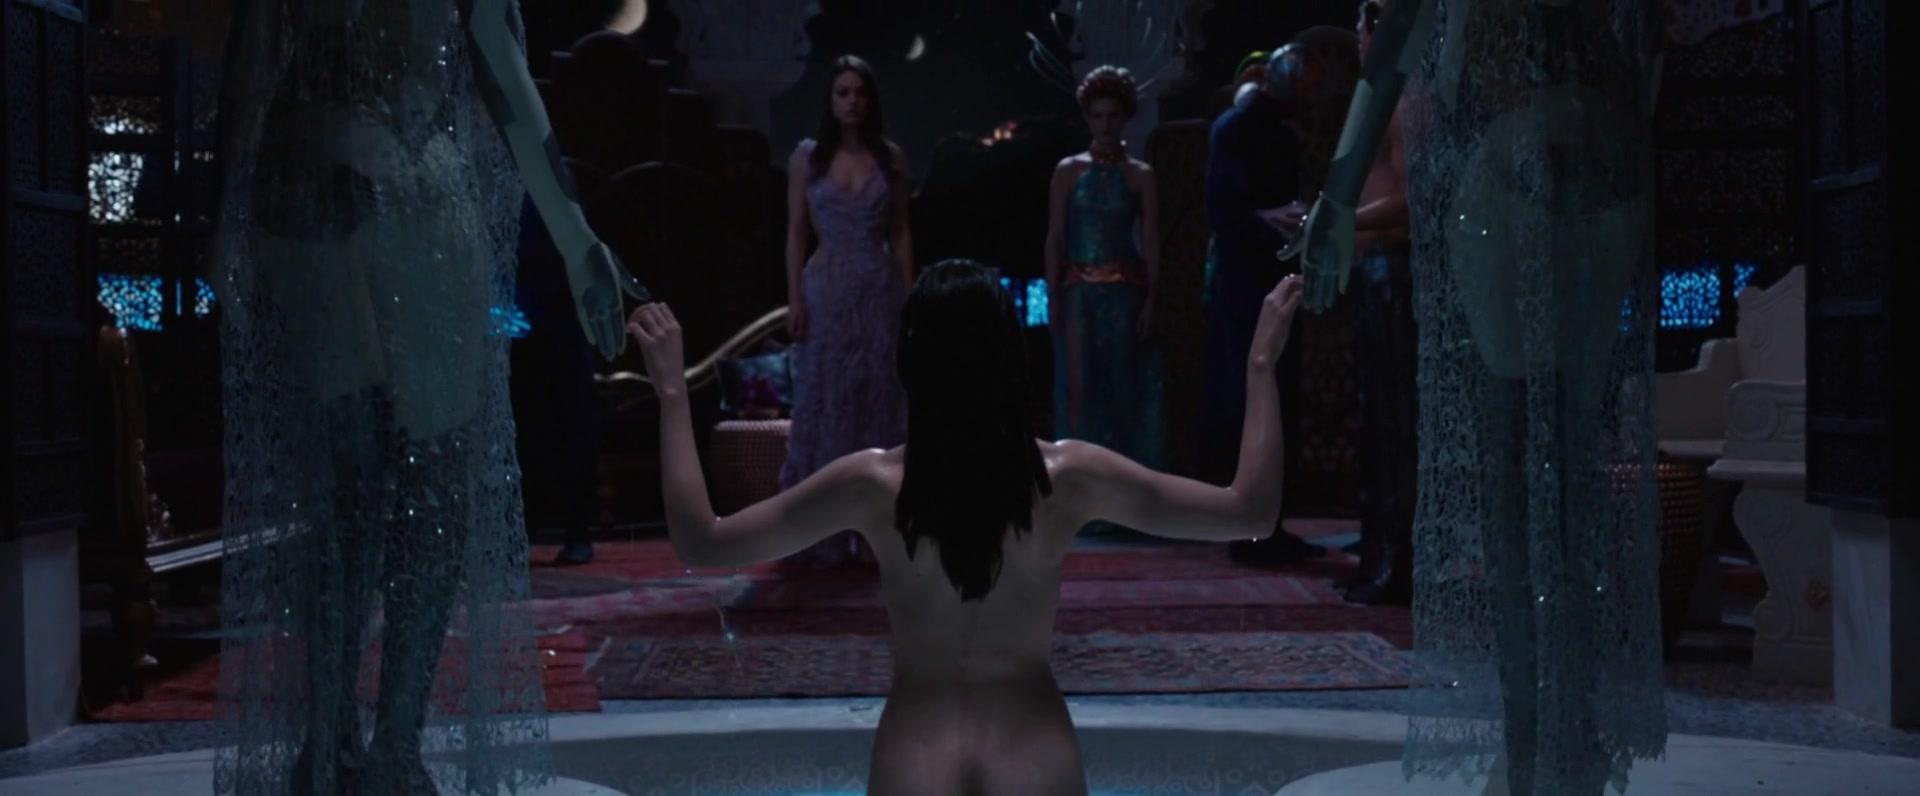 Young Alexis Ren nudes (18 photo), Sexy, Sideboobs, Selfie, braless 2017